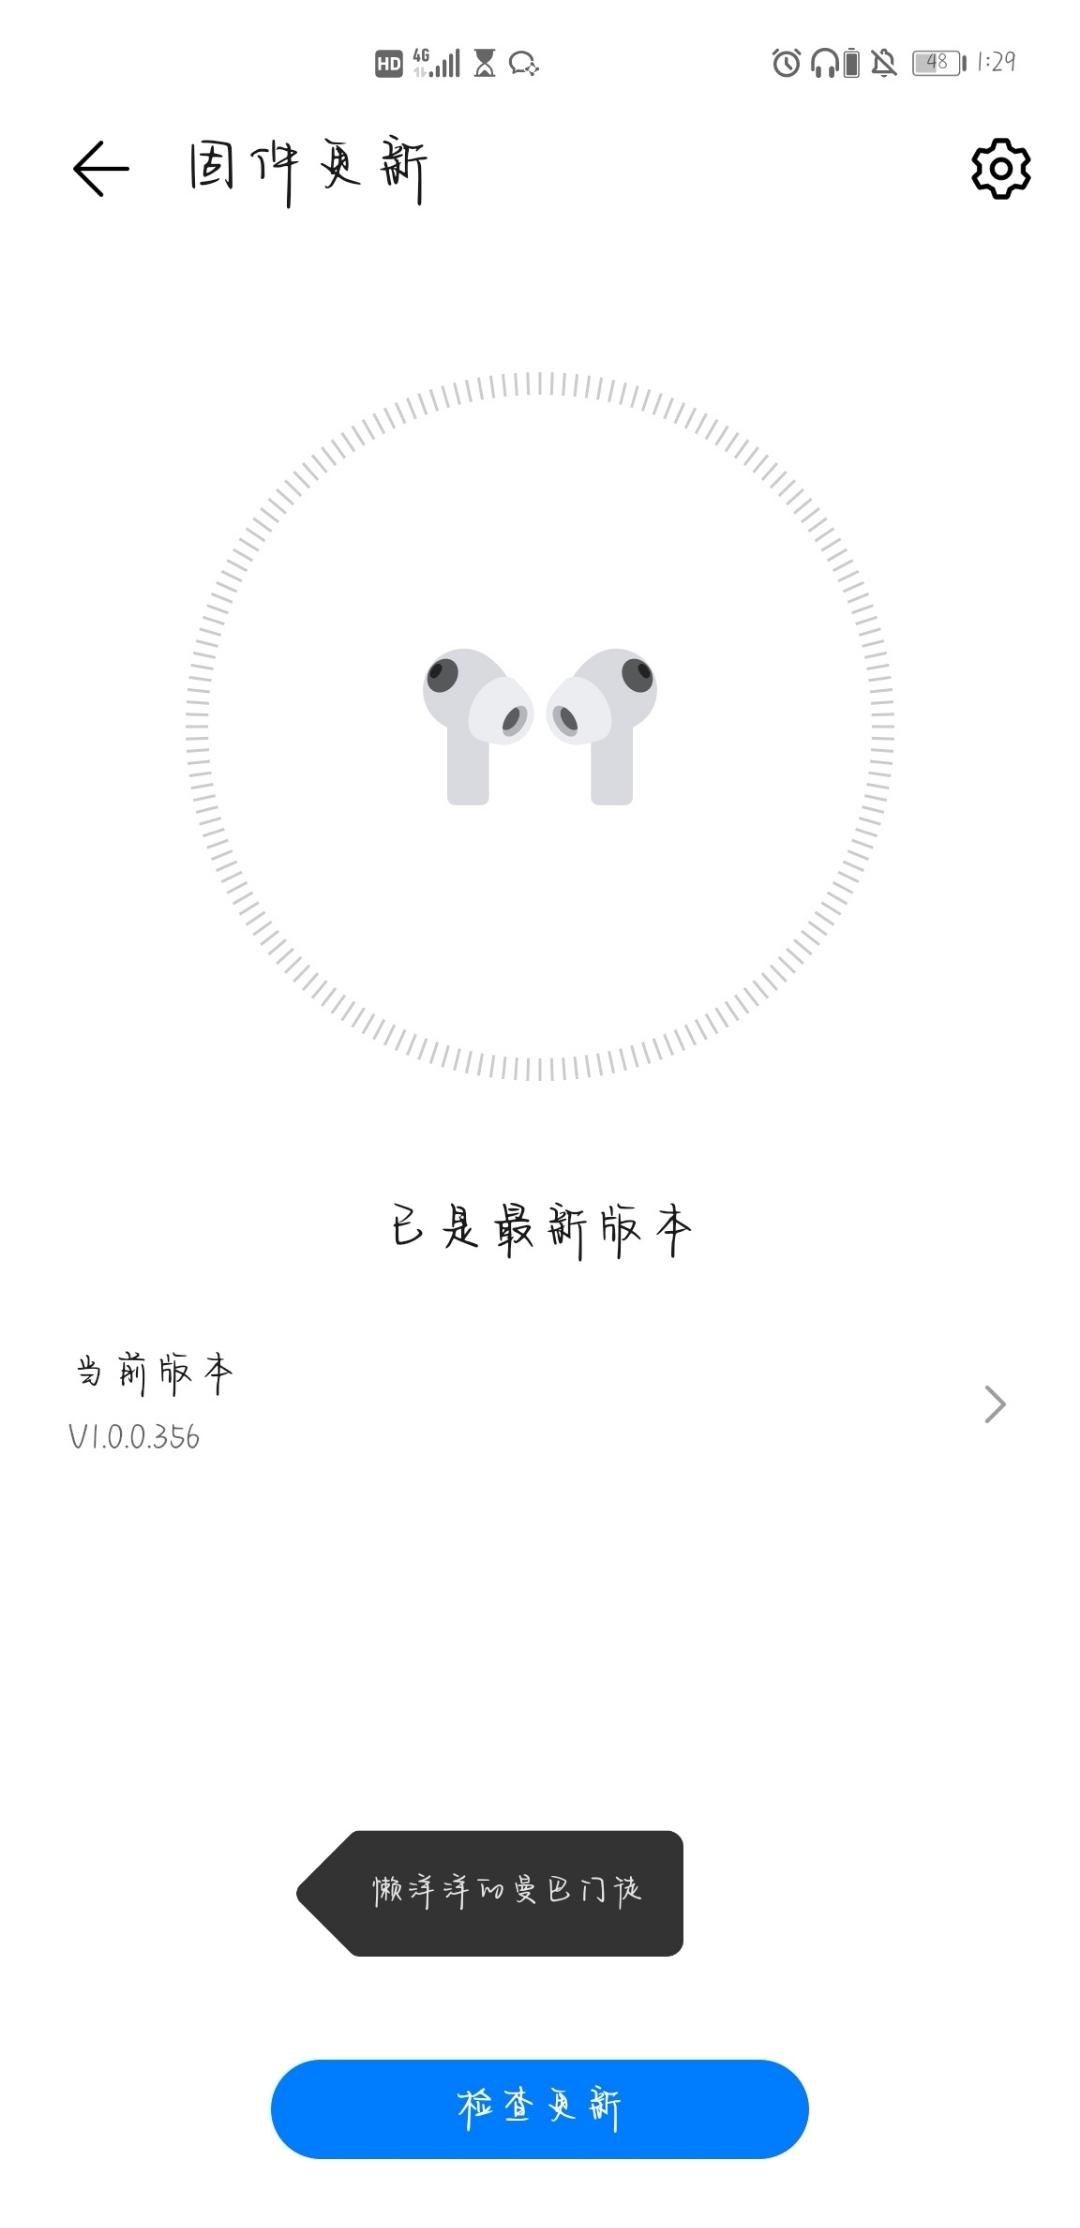 Screenshot_20210329_132957_com.huawei.smarthome_edit_269732732394257.jpg